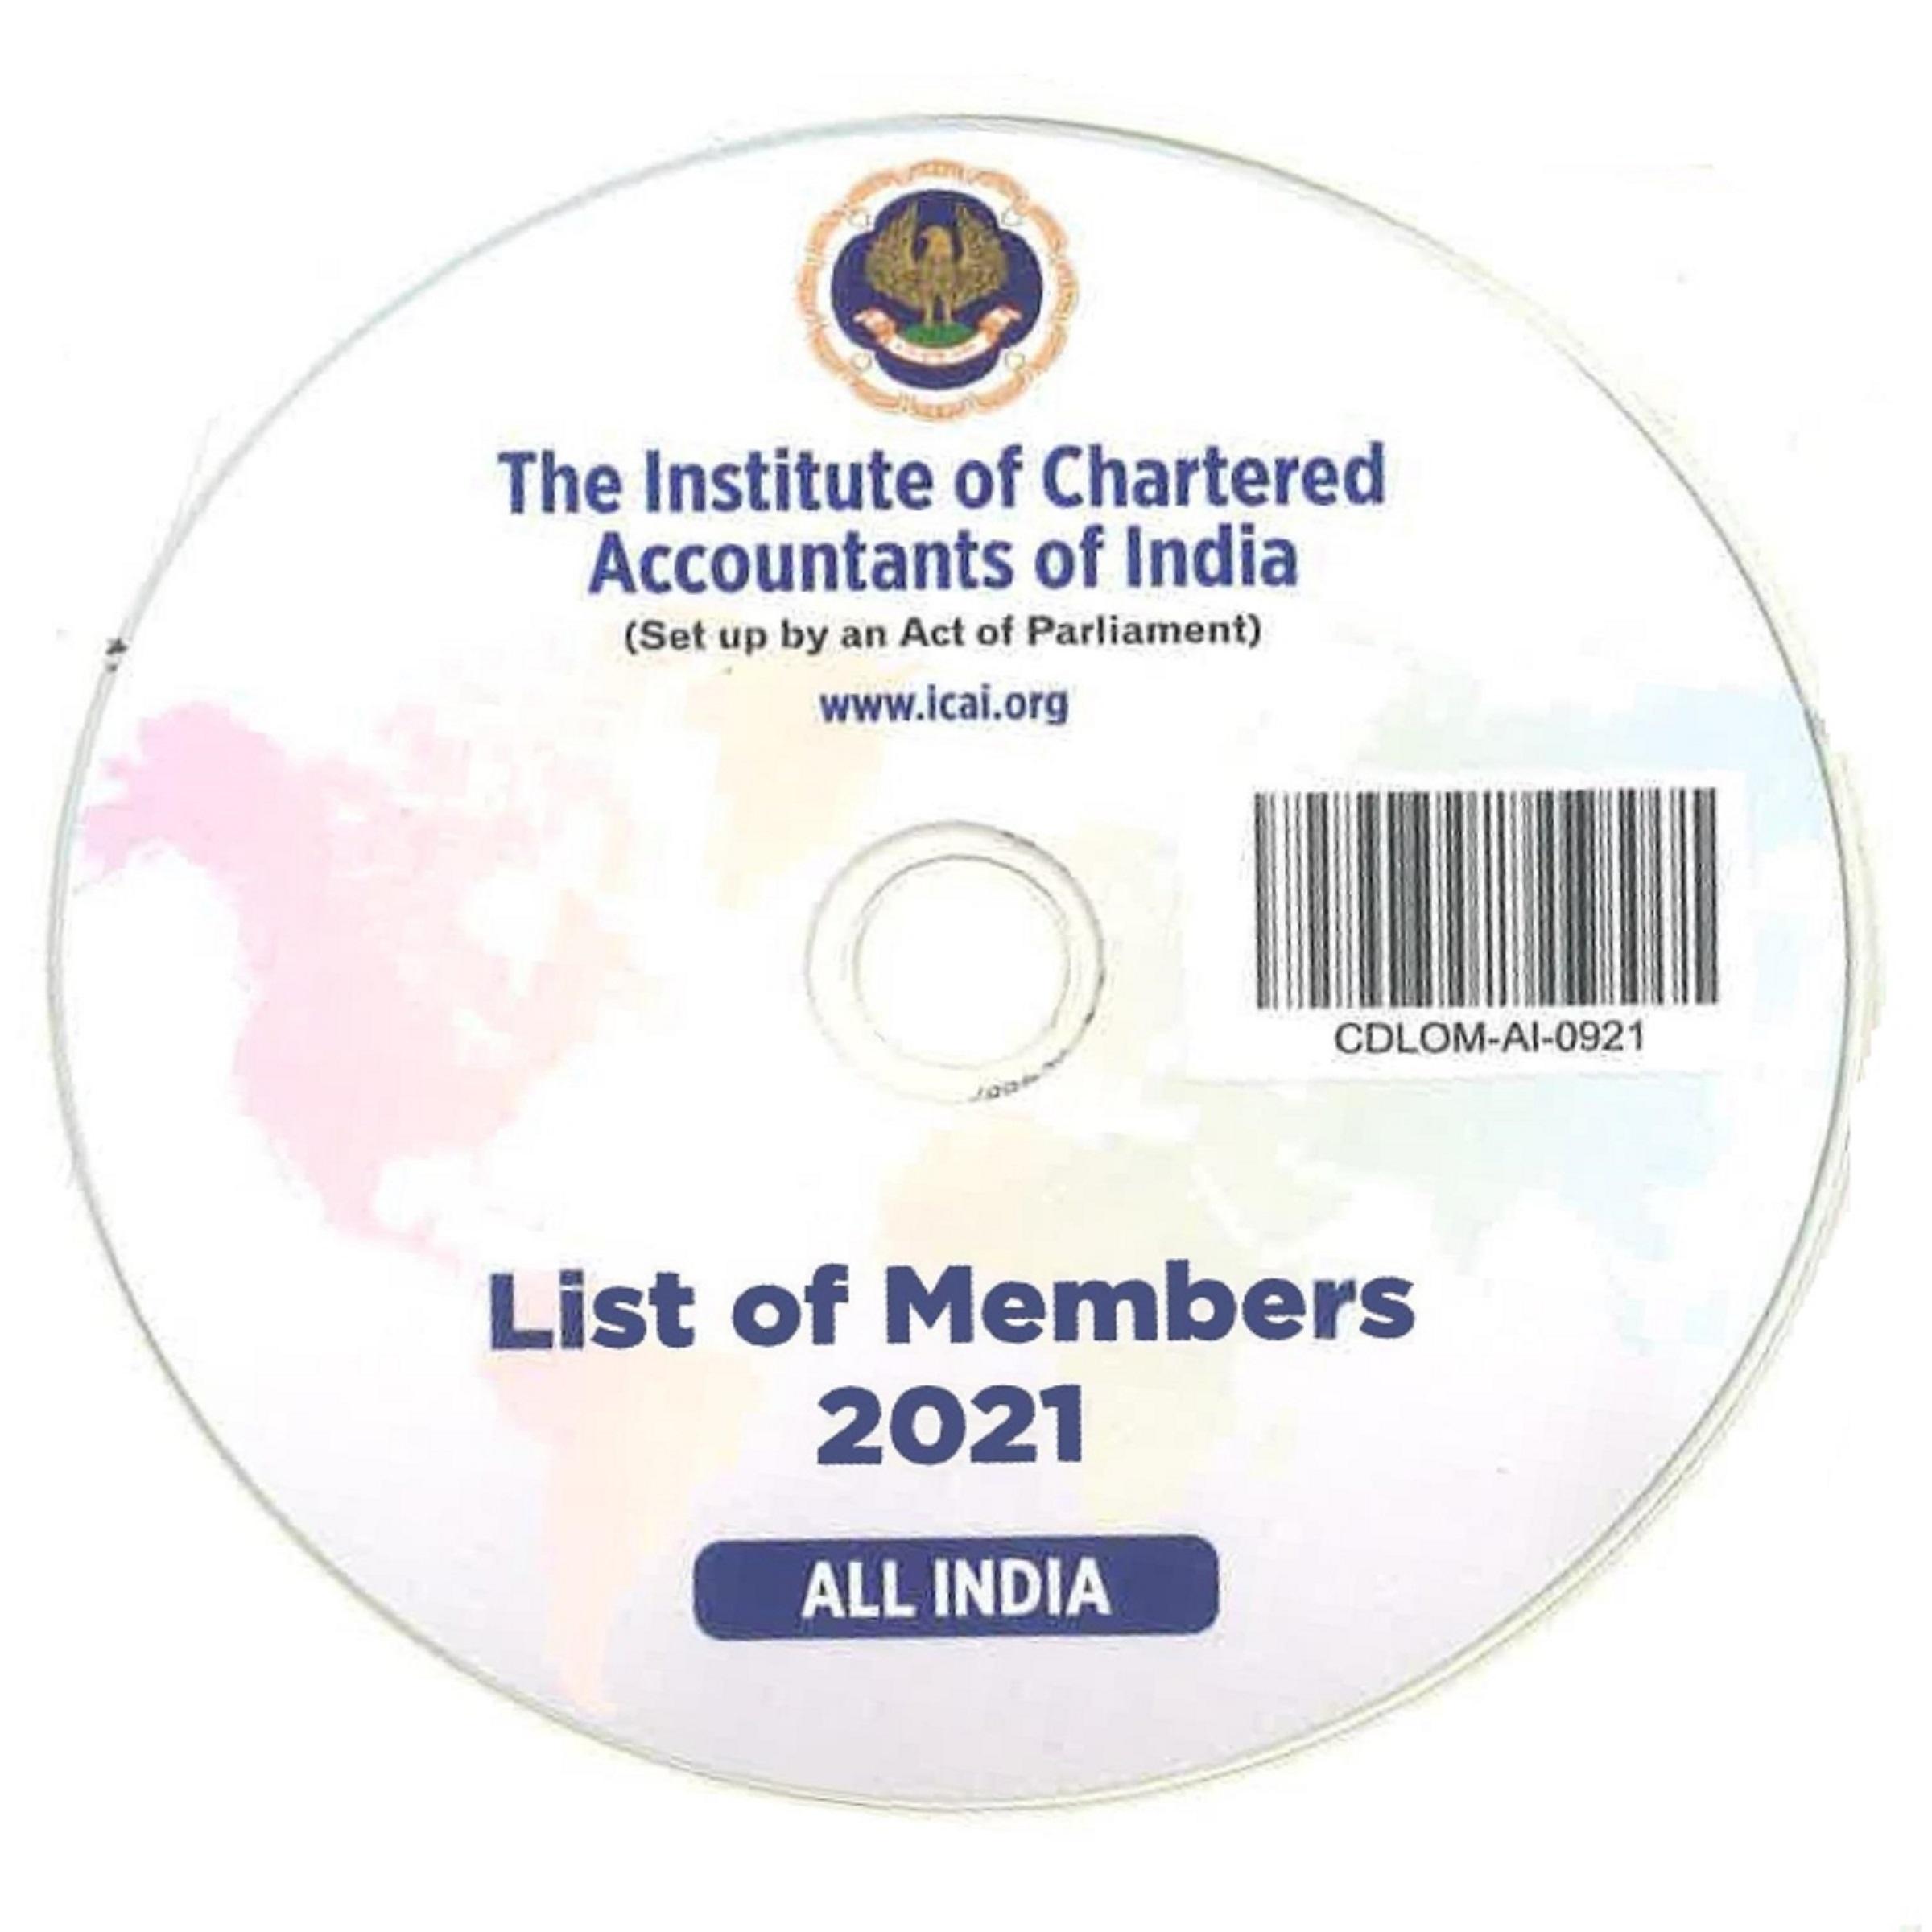 CD-List of Members, 2021 (All India Basis)